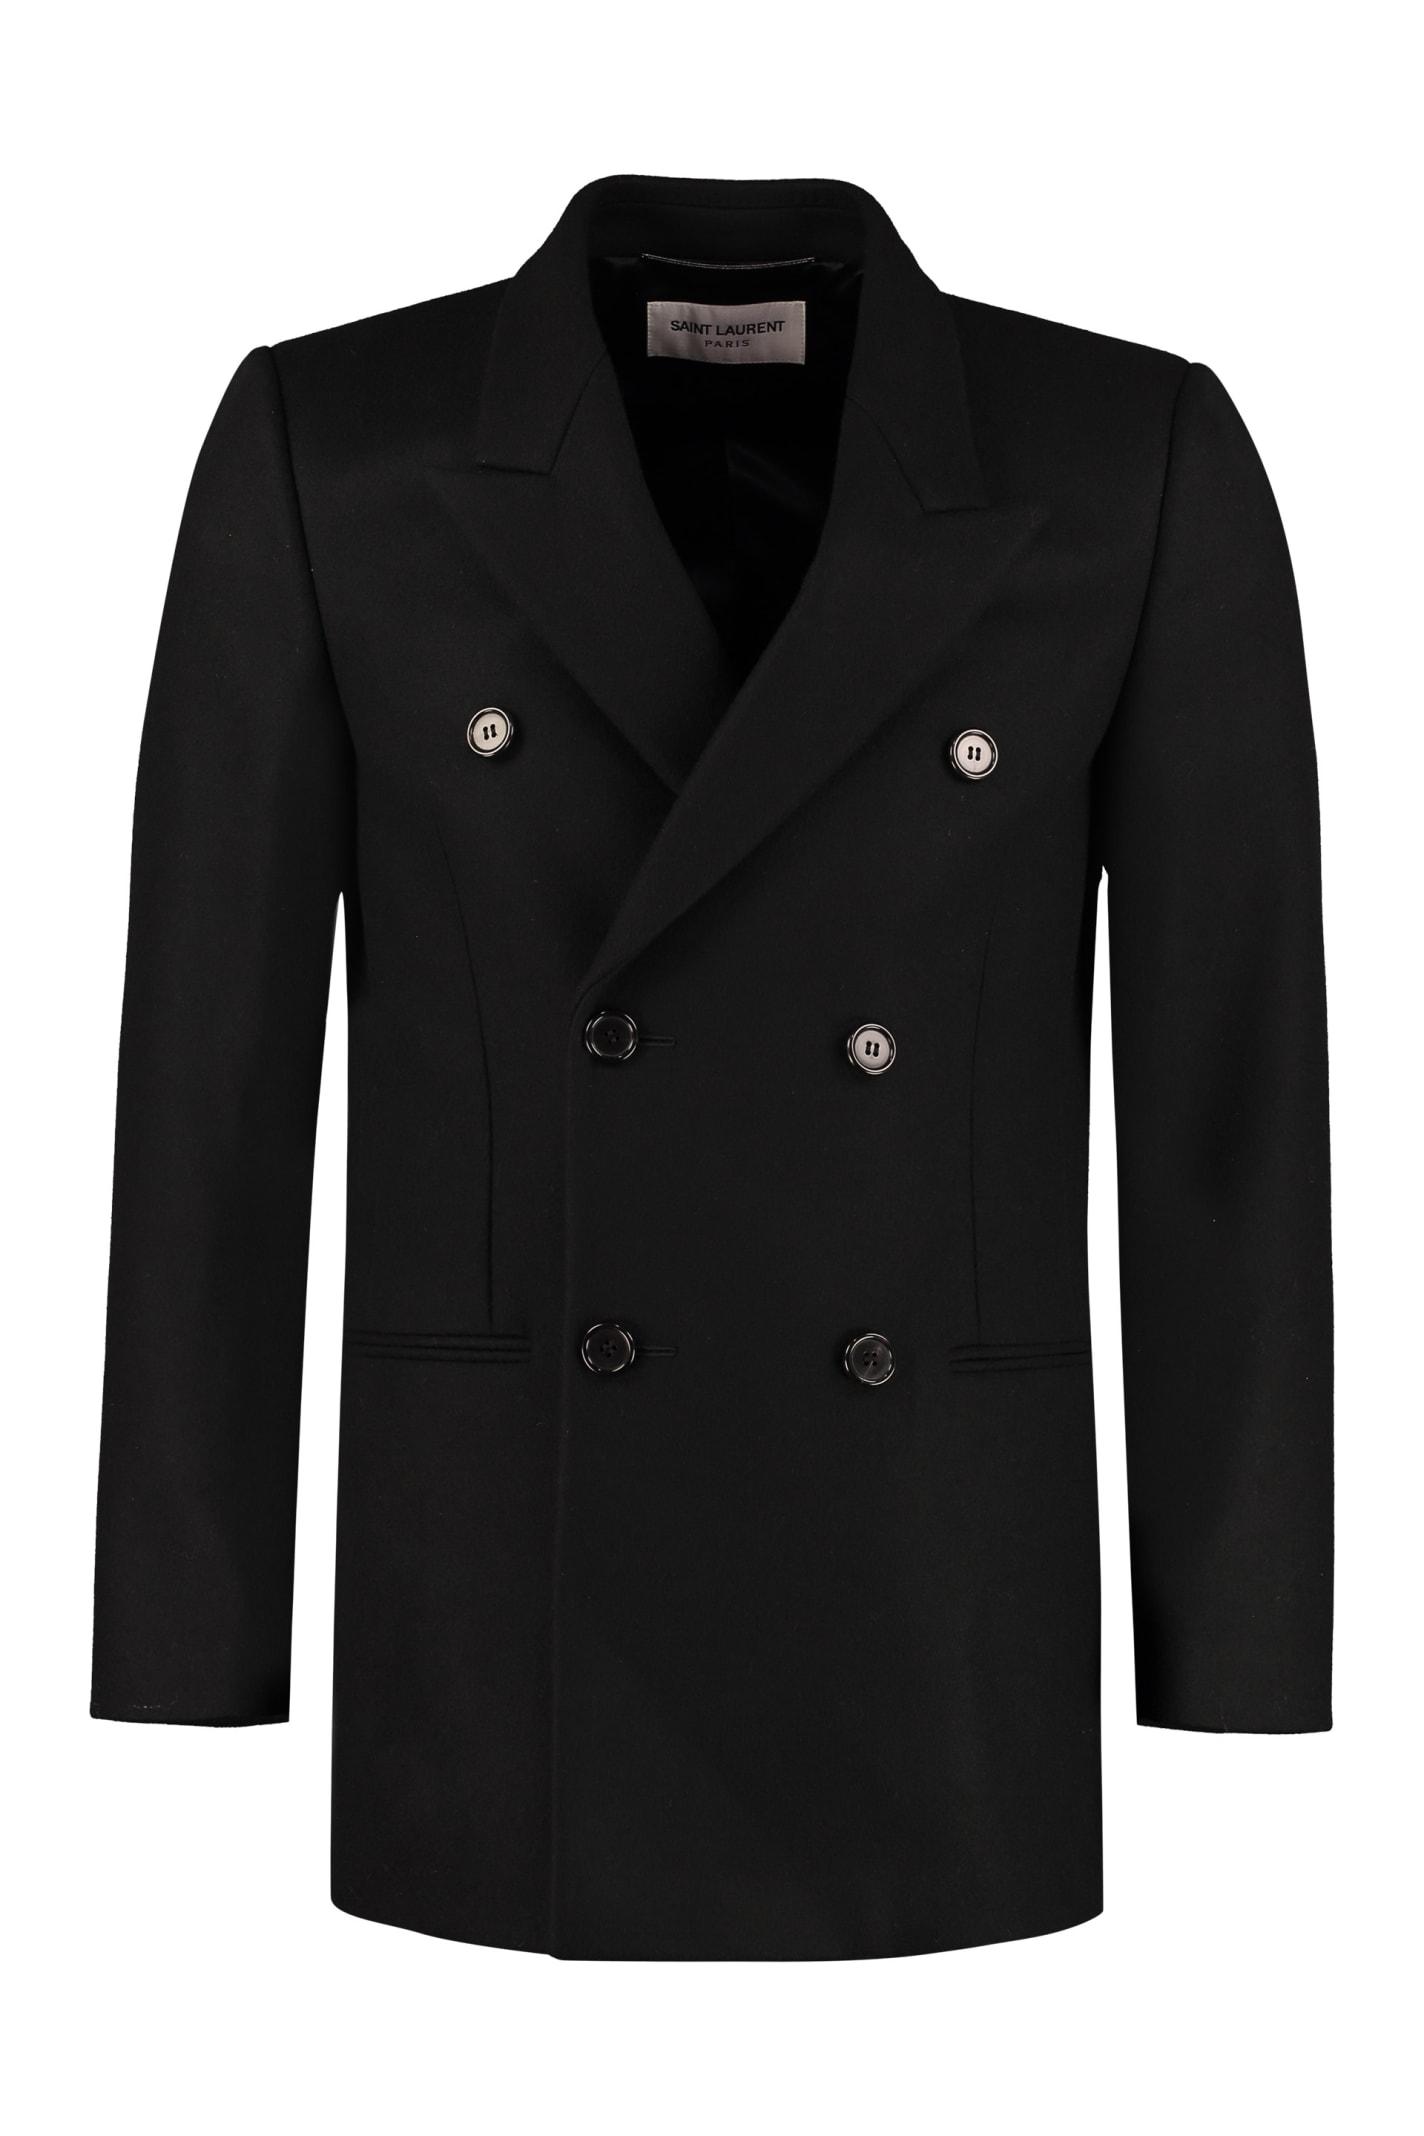 Saint Laurent Virgin Wool Double-breasted Coat